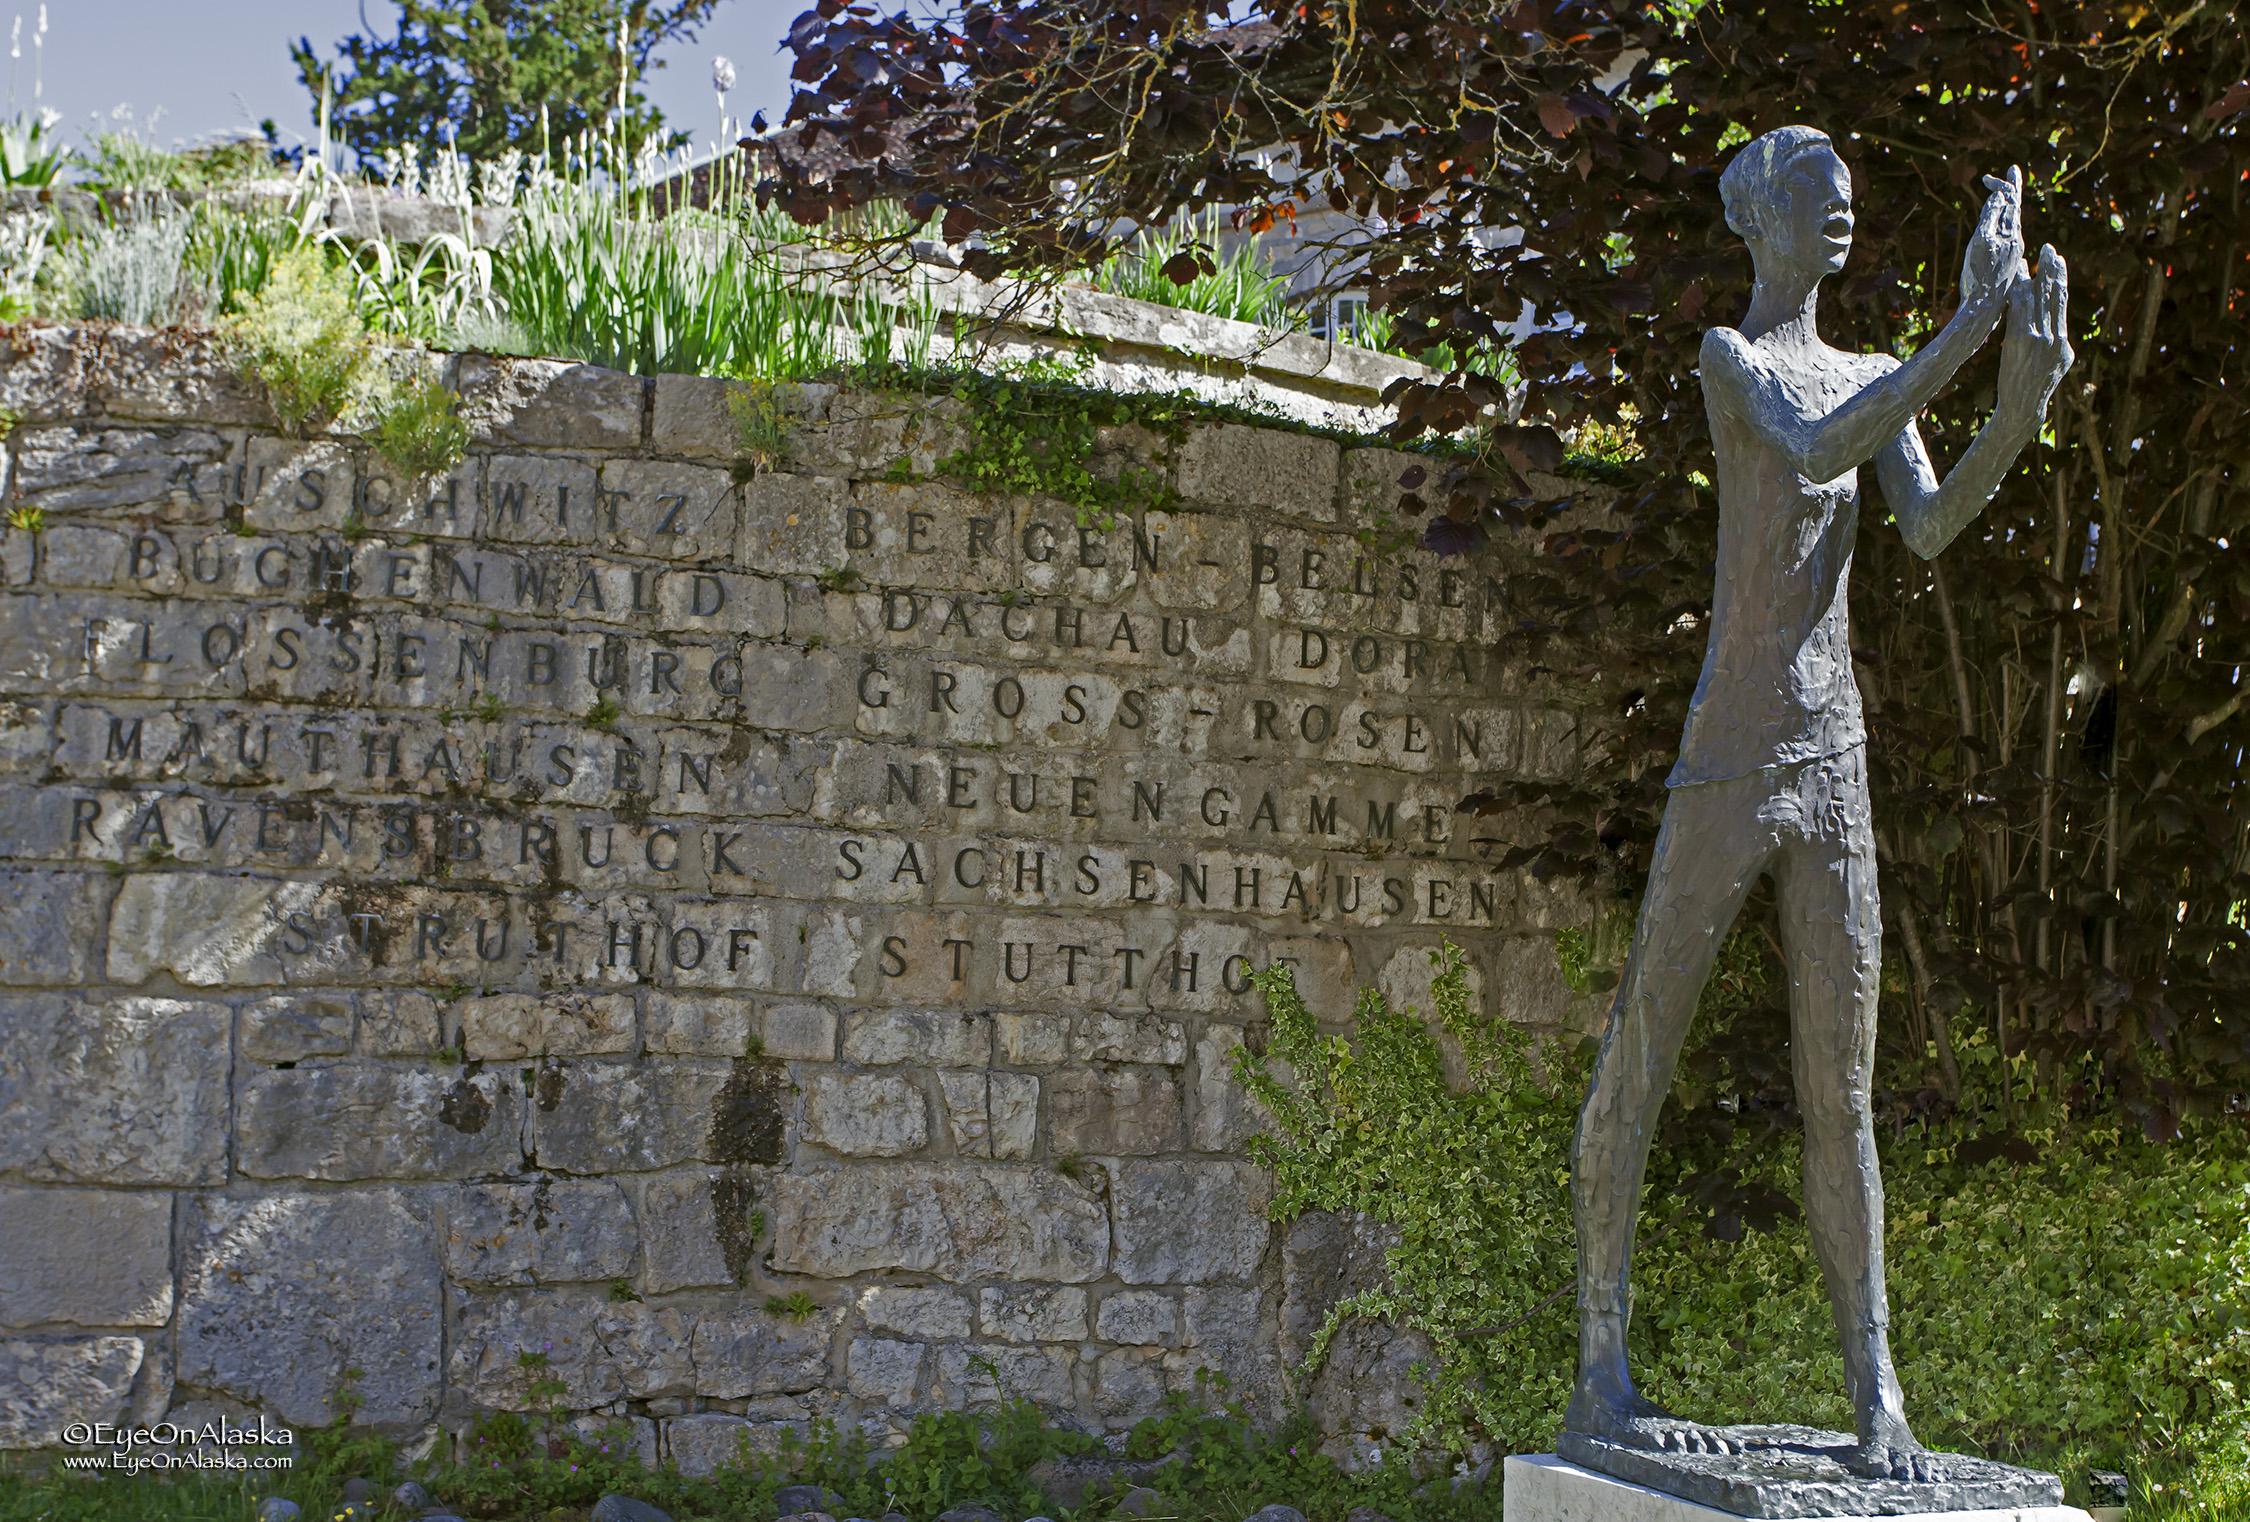 Art work inside the Citadel memorializing the Holocaust.